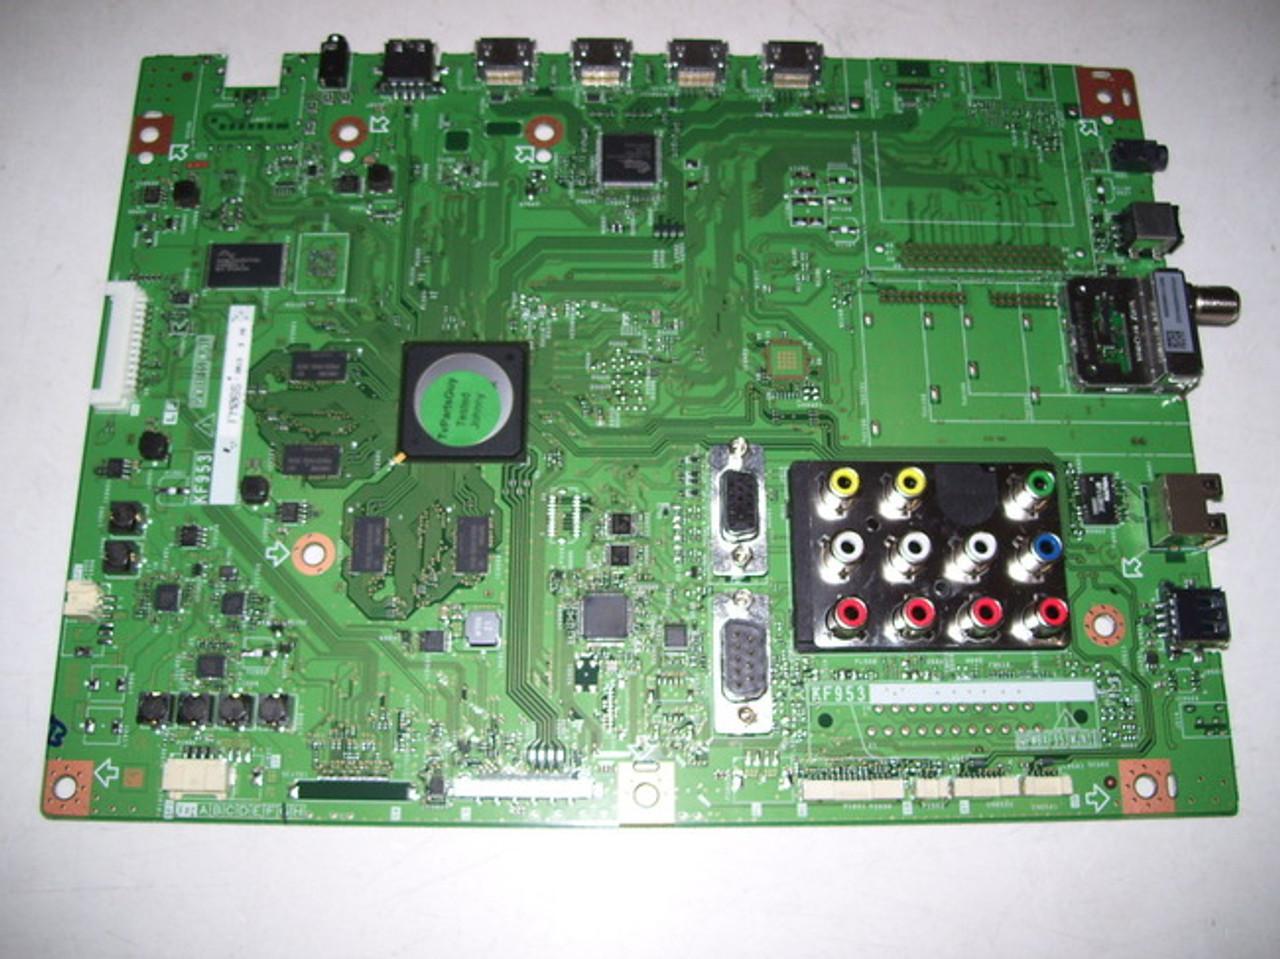 SHARP LC-60LE757U MAIN BOARD KF953 / DKEYMF953FM06 (VER: 1)